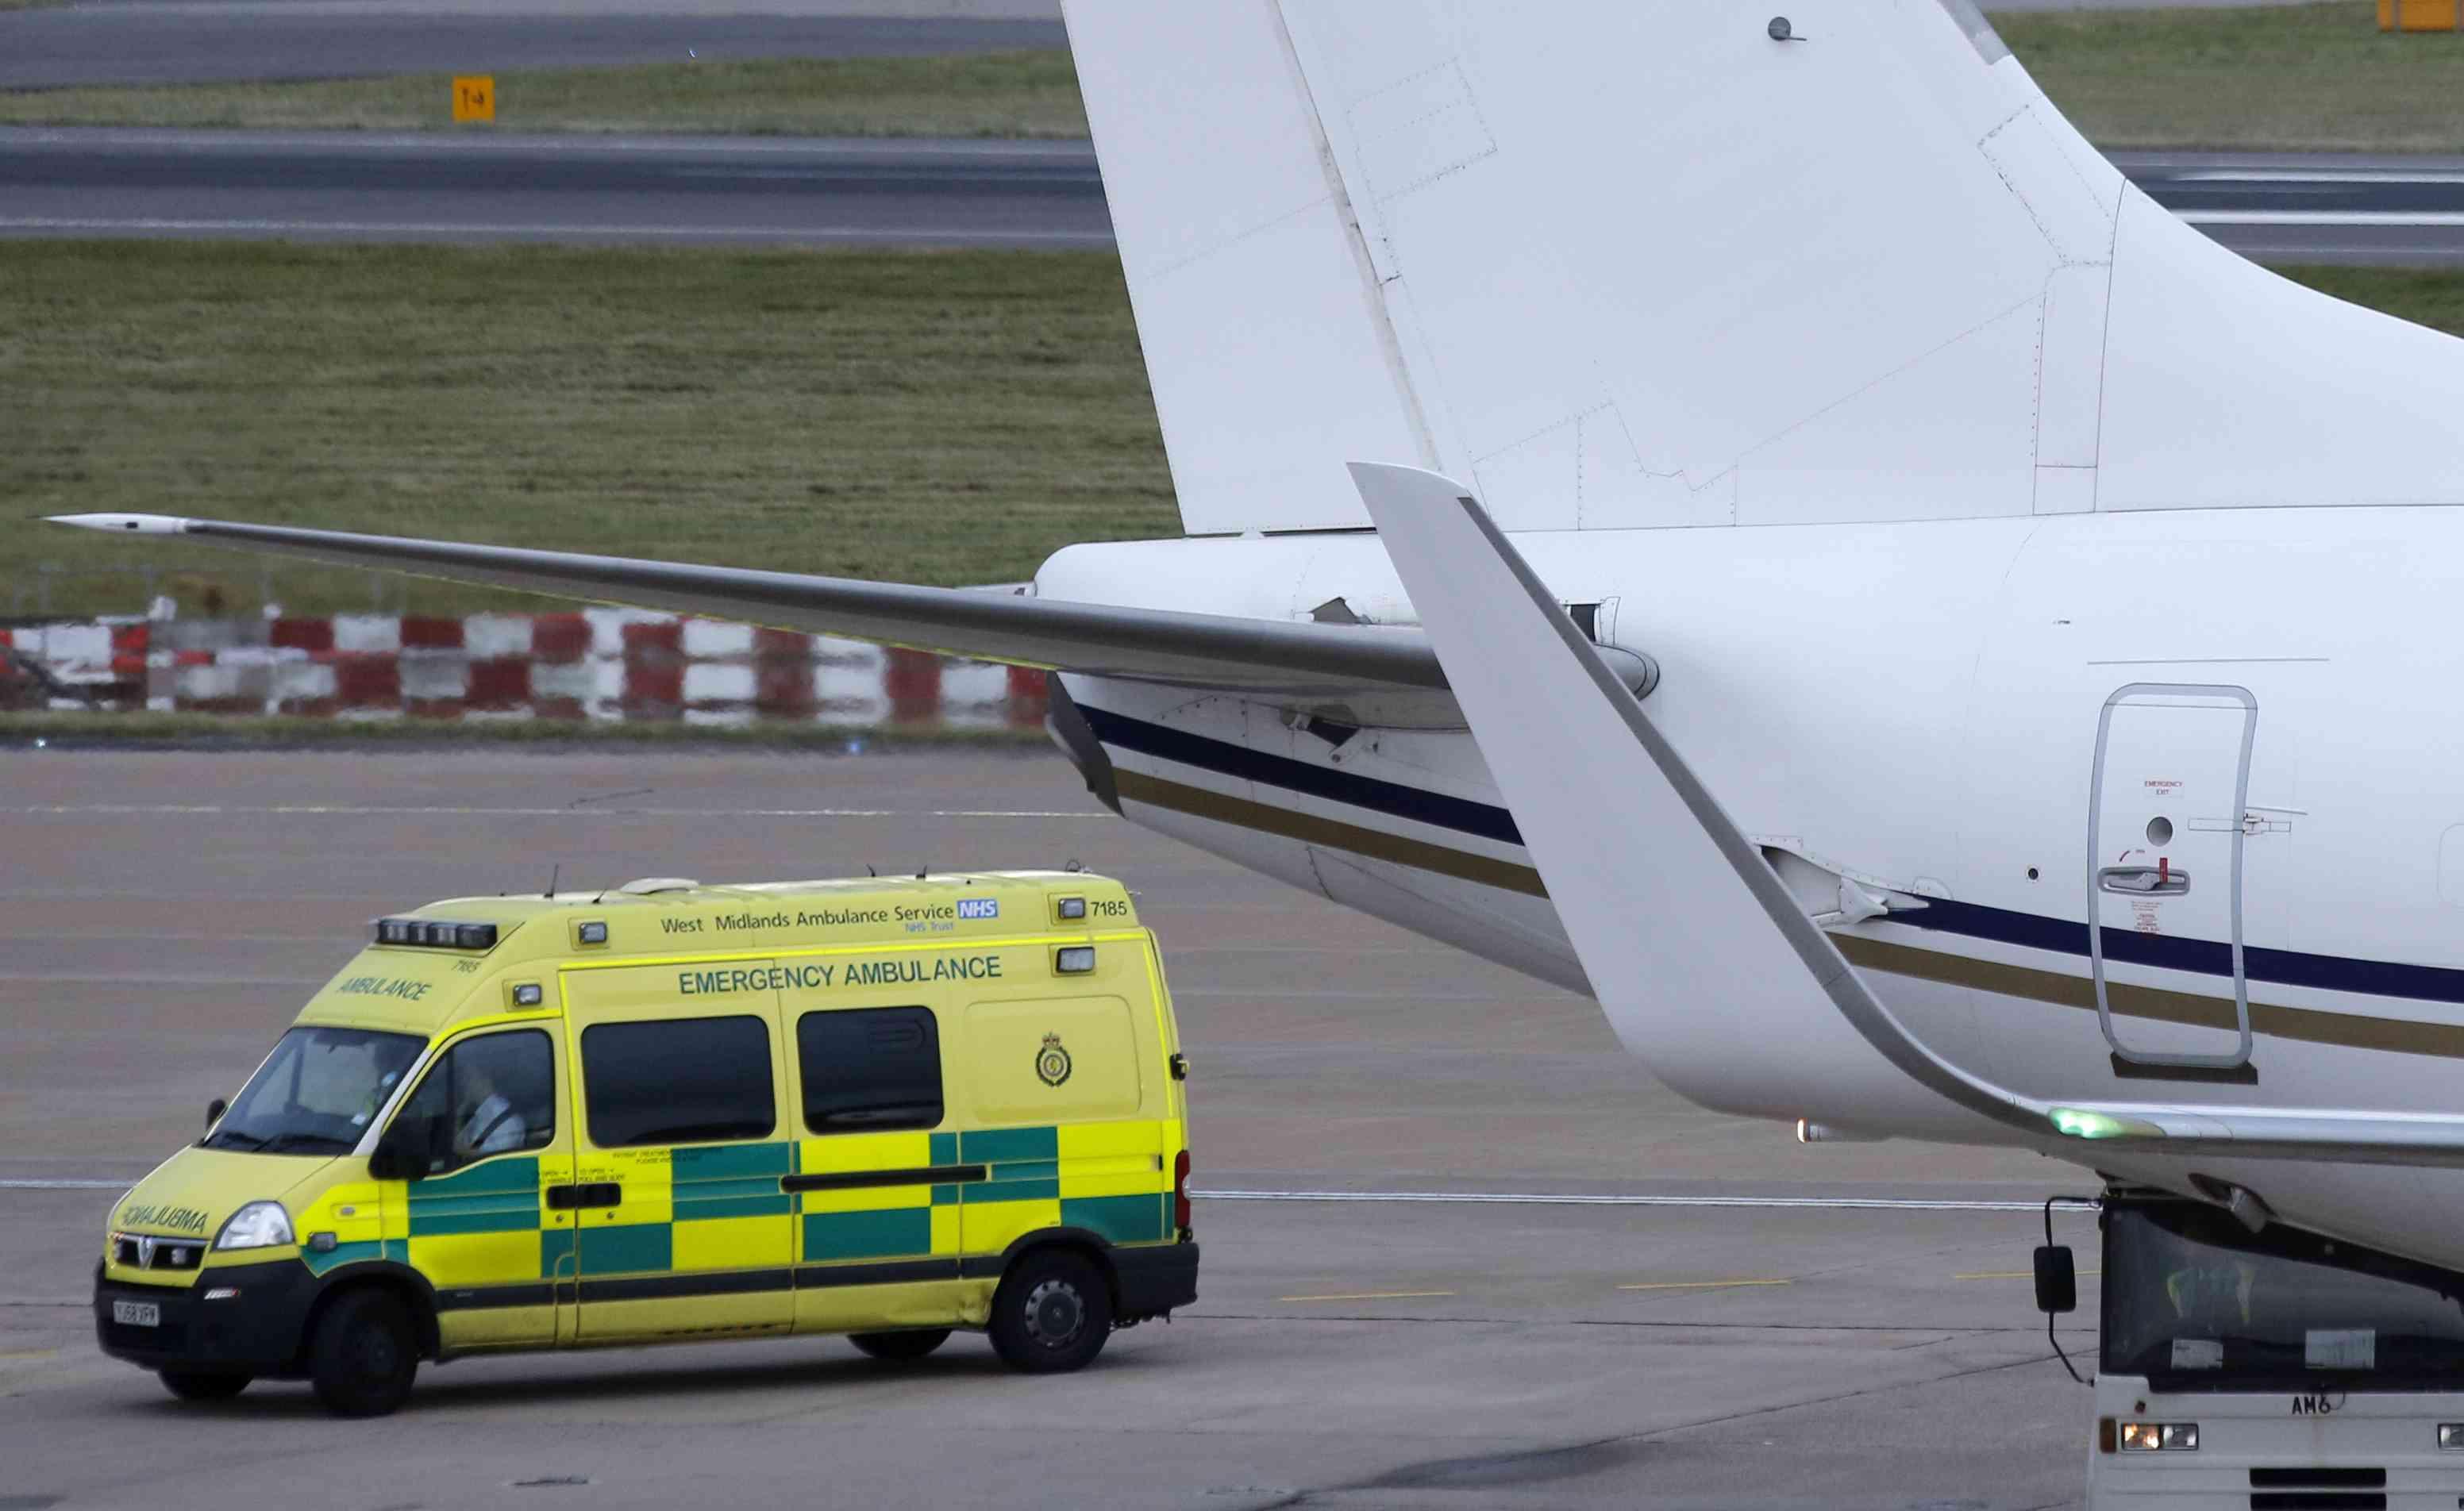 An ambulance carries injured Pakistani teenager Malala Yousufzai from a Emirati medical transport aircraft at Birmingham International airport in central England October 15, 2012 | Photo credit: Chris Helgren / Reuters